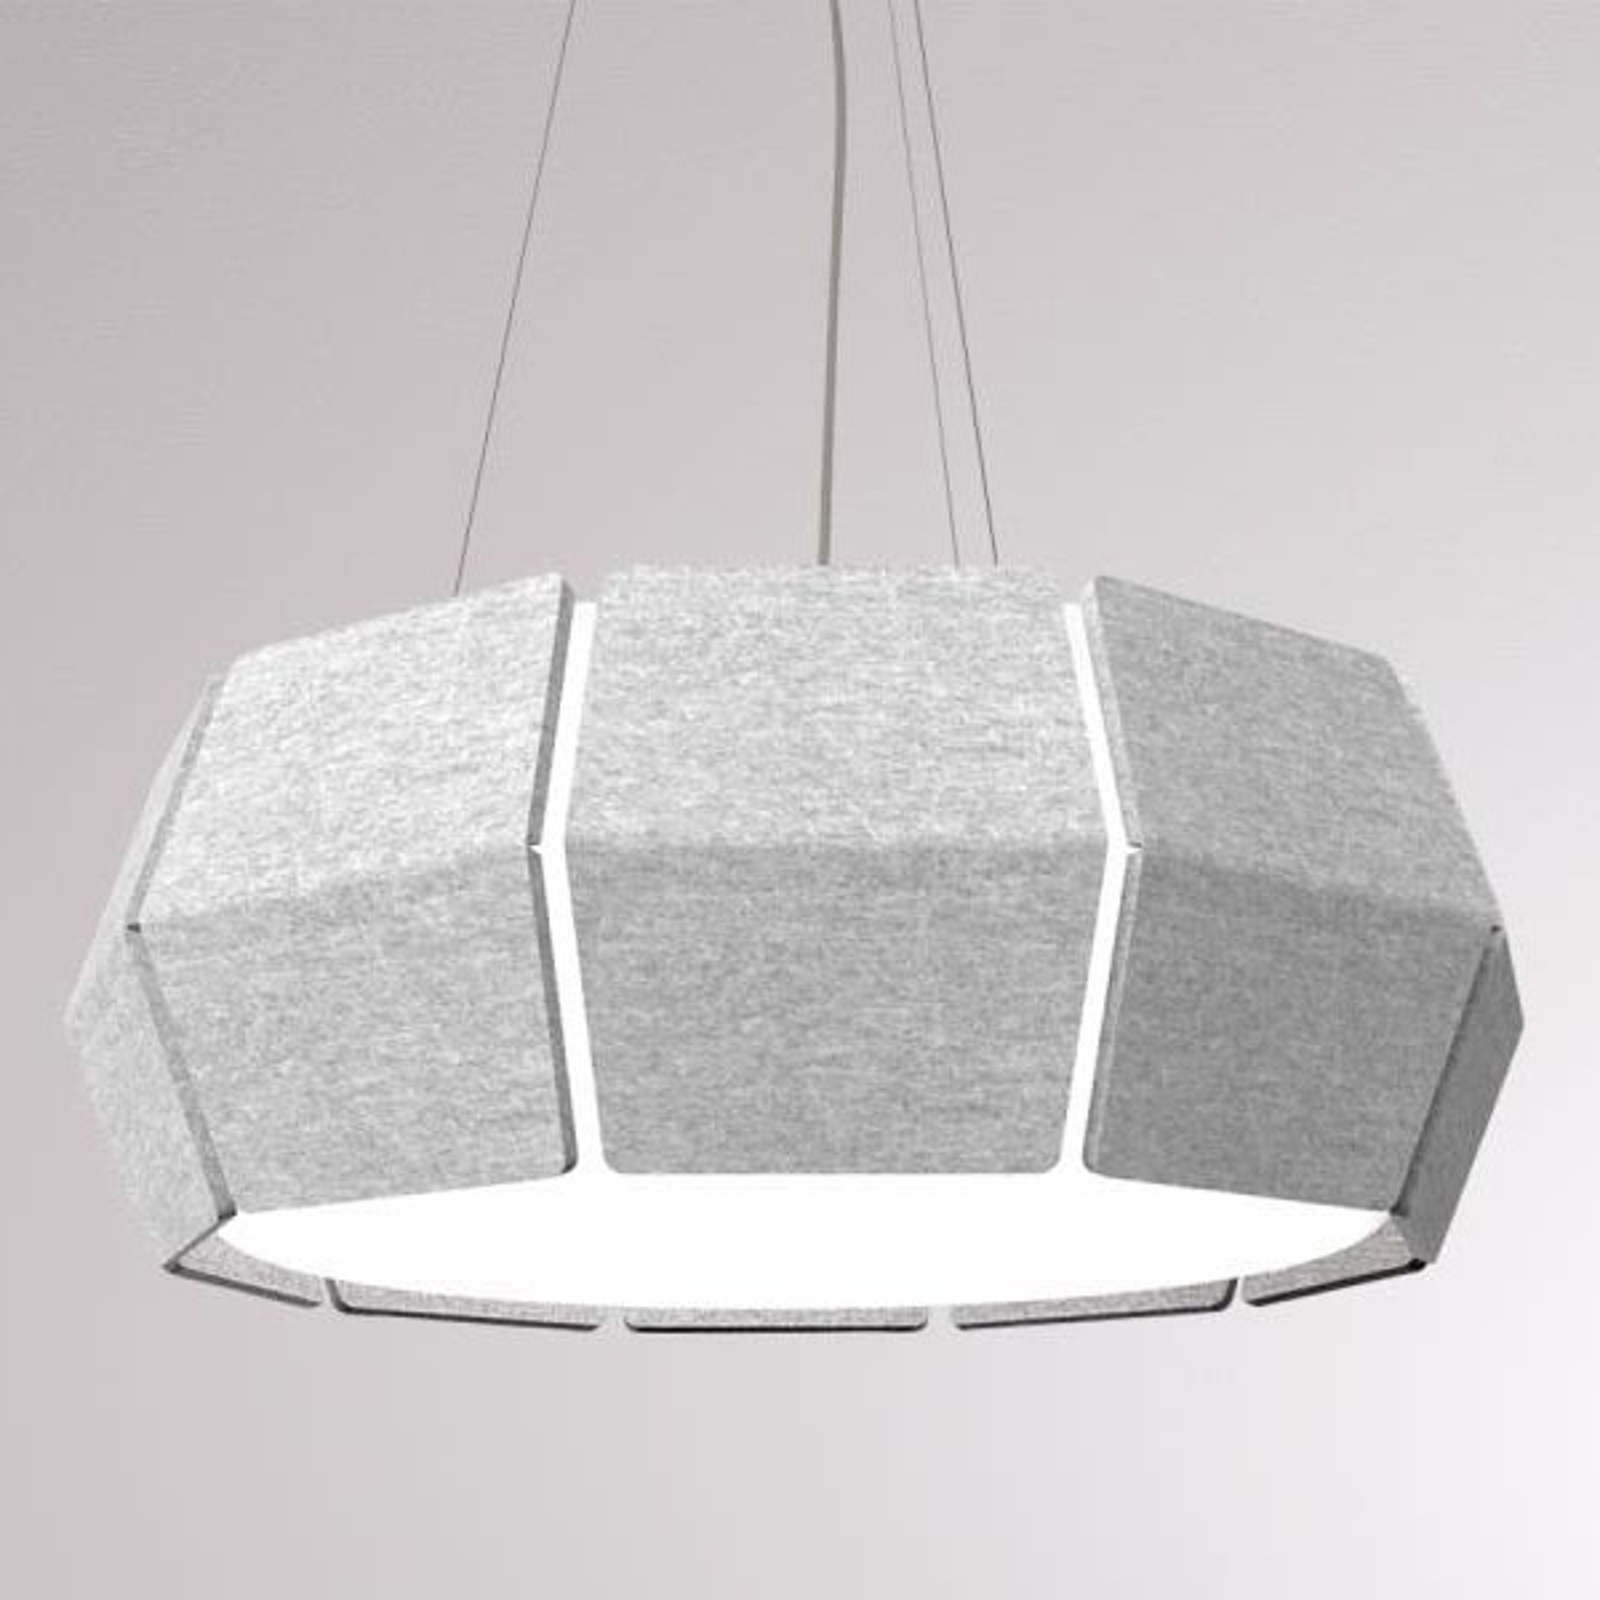 LOUM Decafelt LED hanglamp akoestiek grijs Ø 54 cm